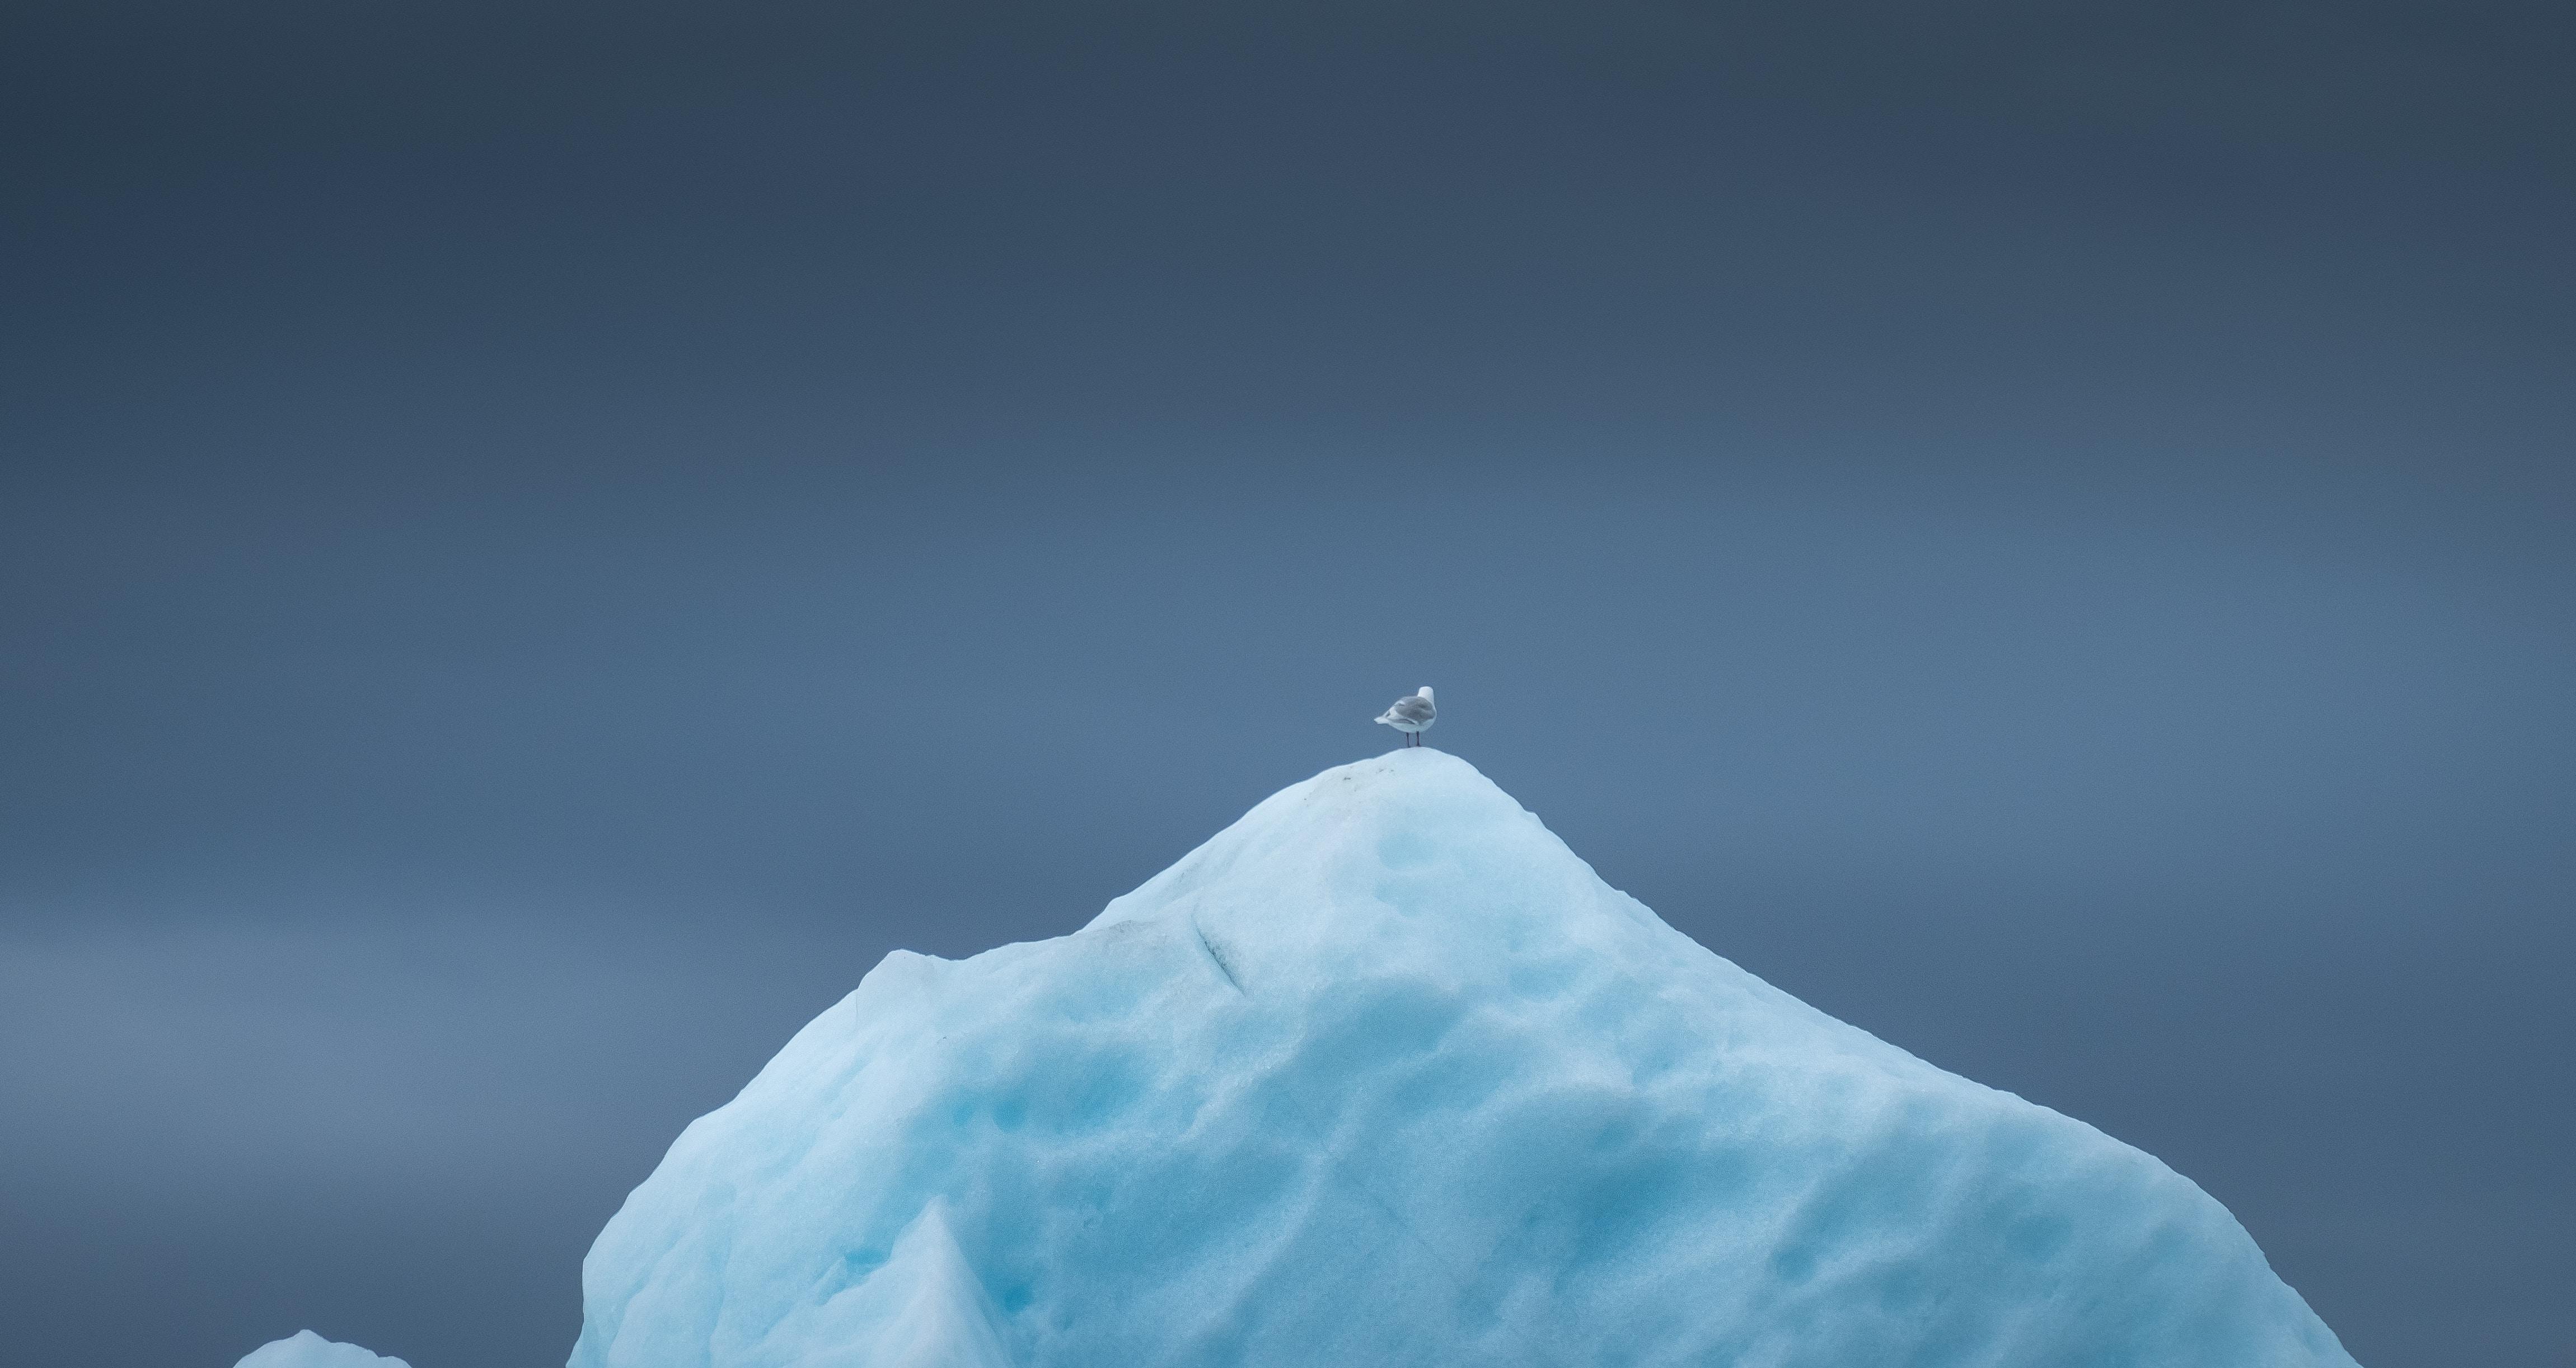 white and brown bird on iceberg wallpaper